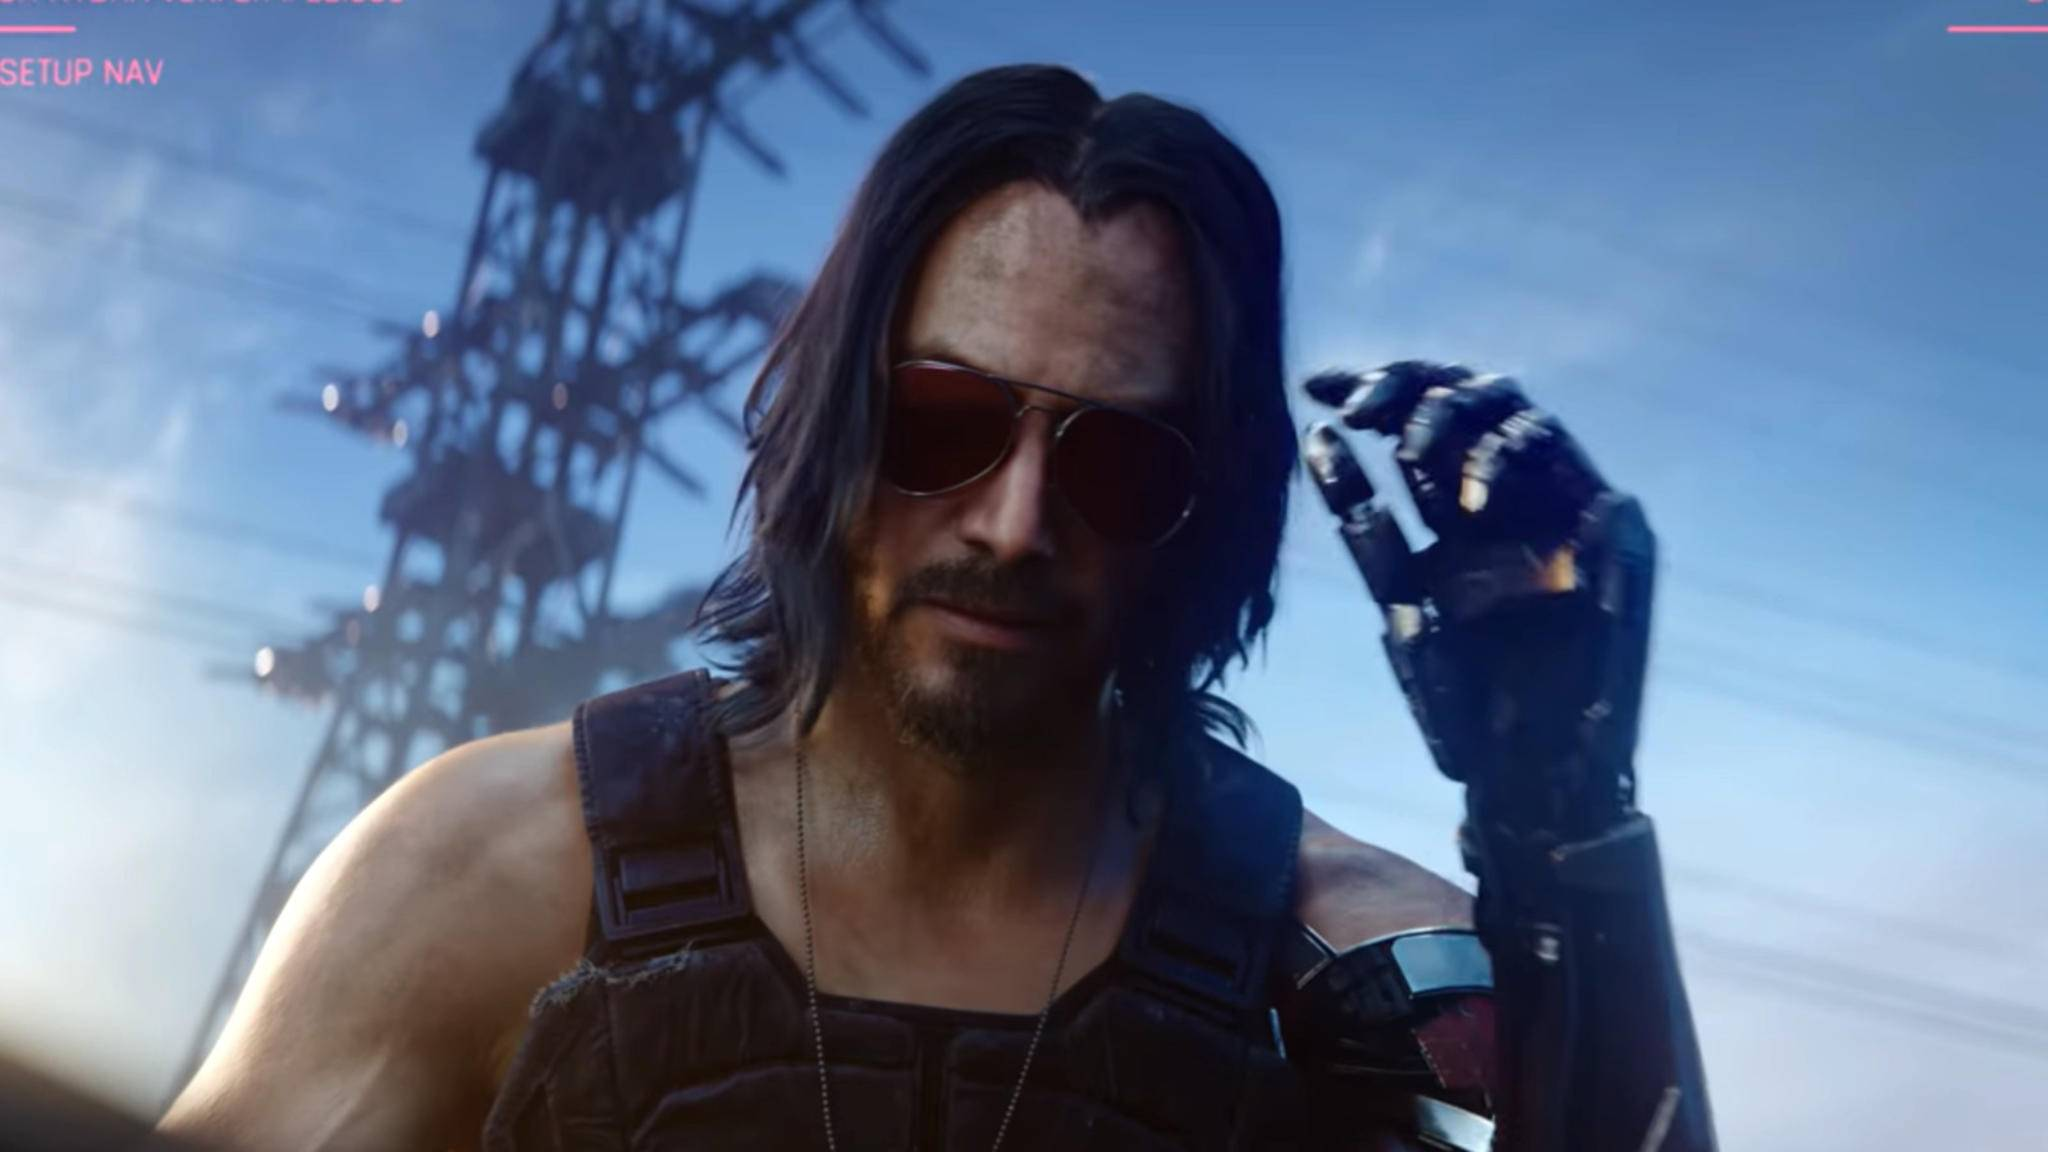 """Cyberpunk 2077"": Keanu Reeves hat Dialoge mitgeschrieben"